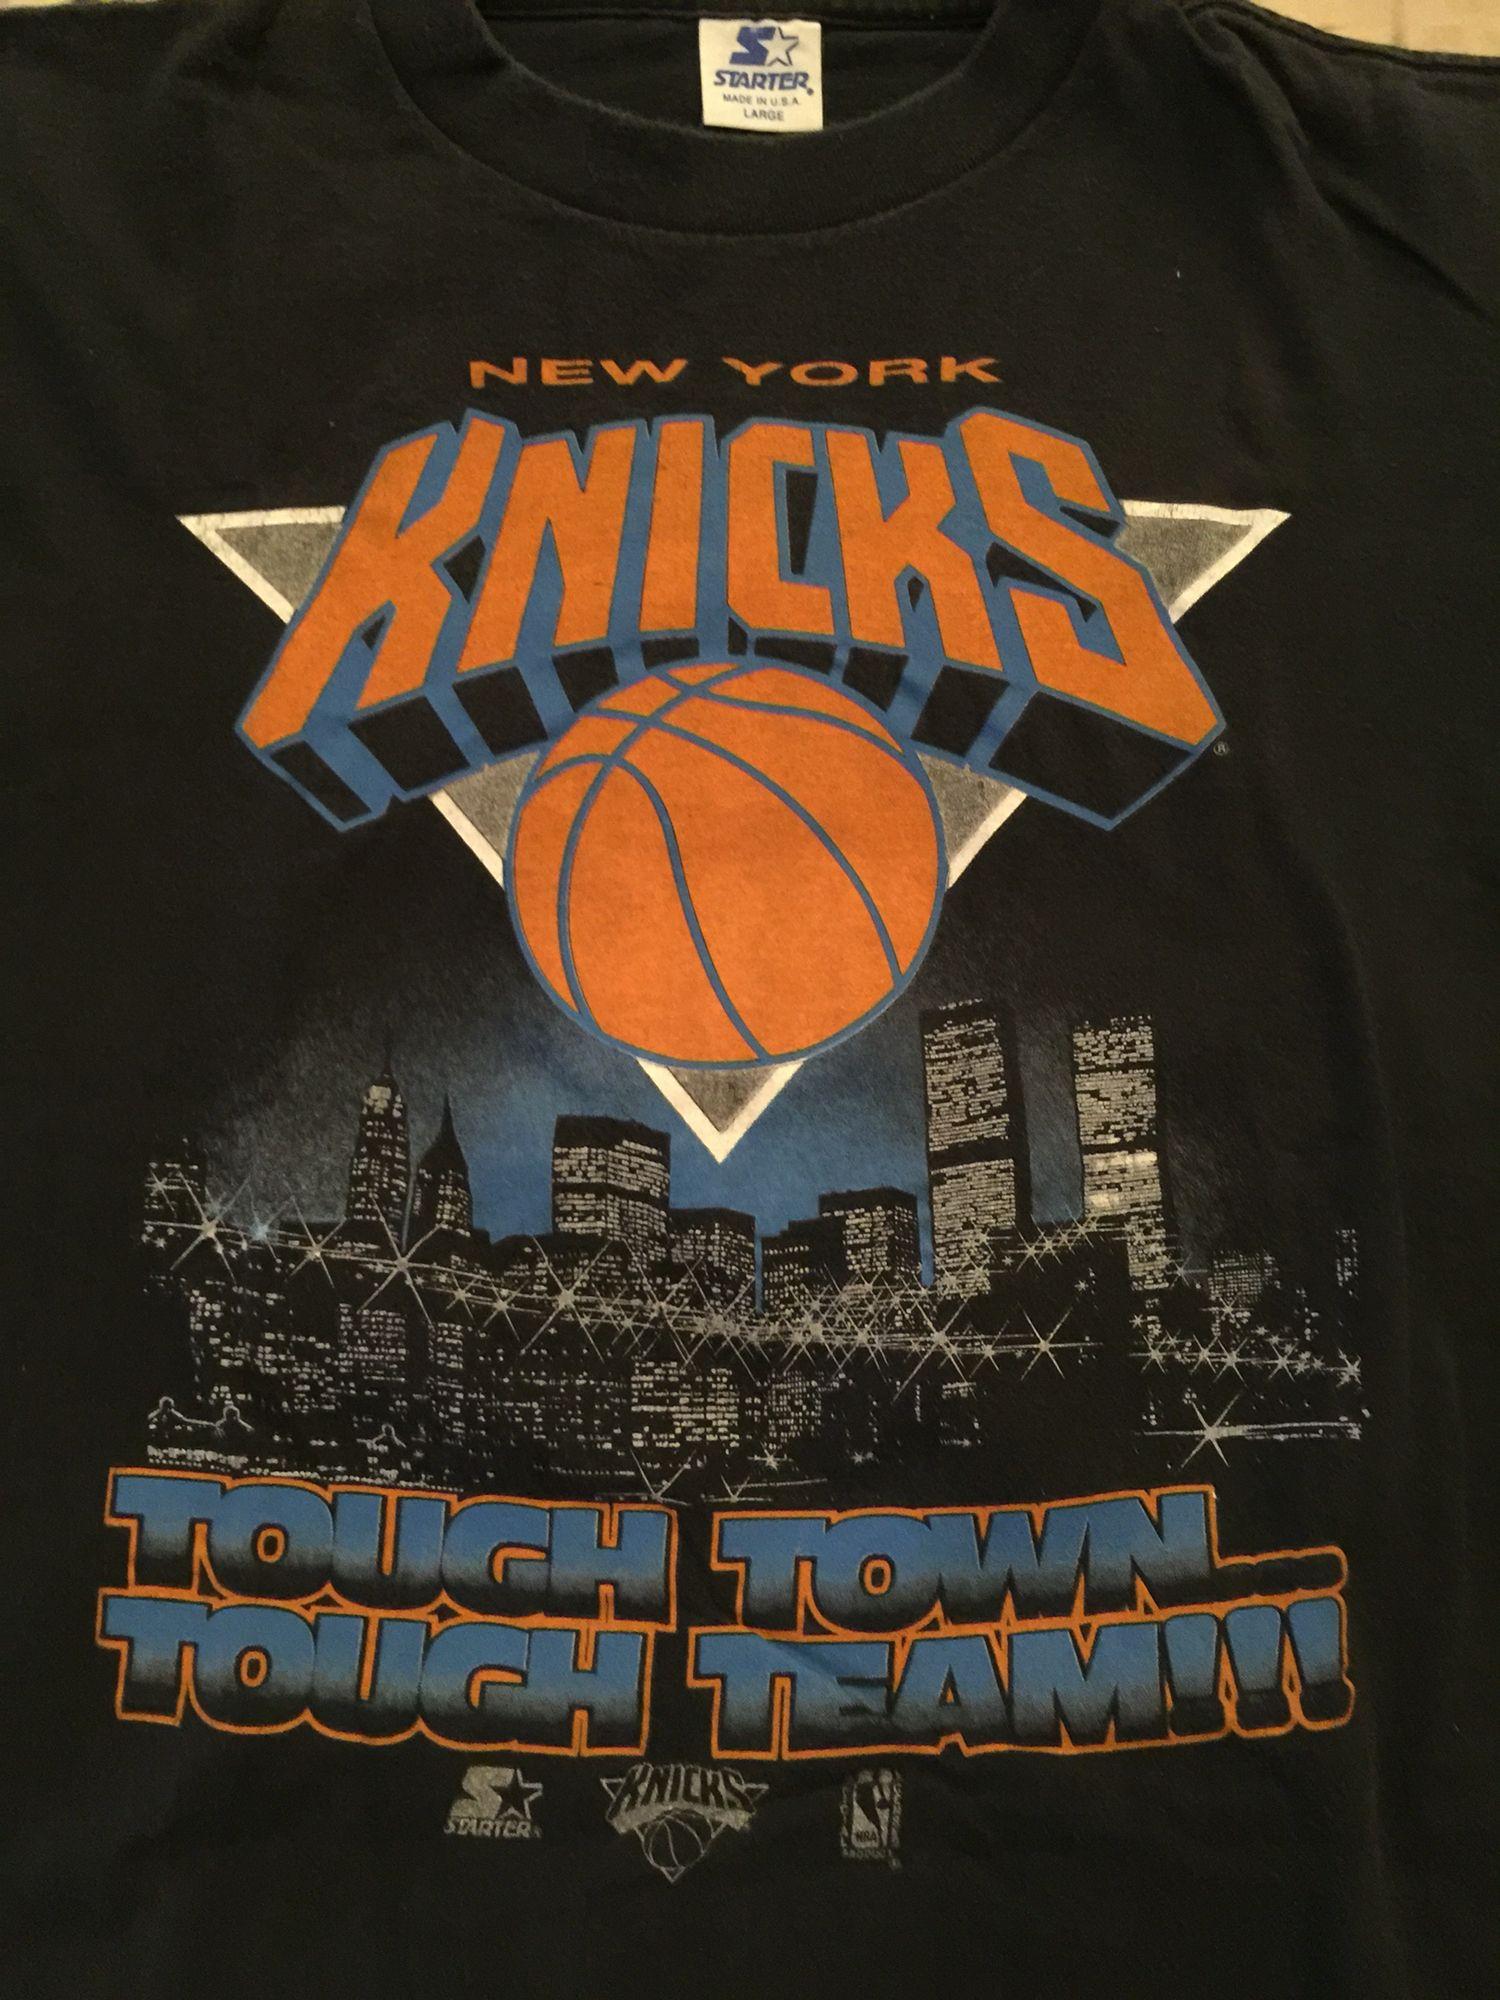 Vintage Ny Knicks Starter 90 S Shirt Vintage Tshirts Ny Knicks 90s Shirts